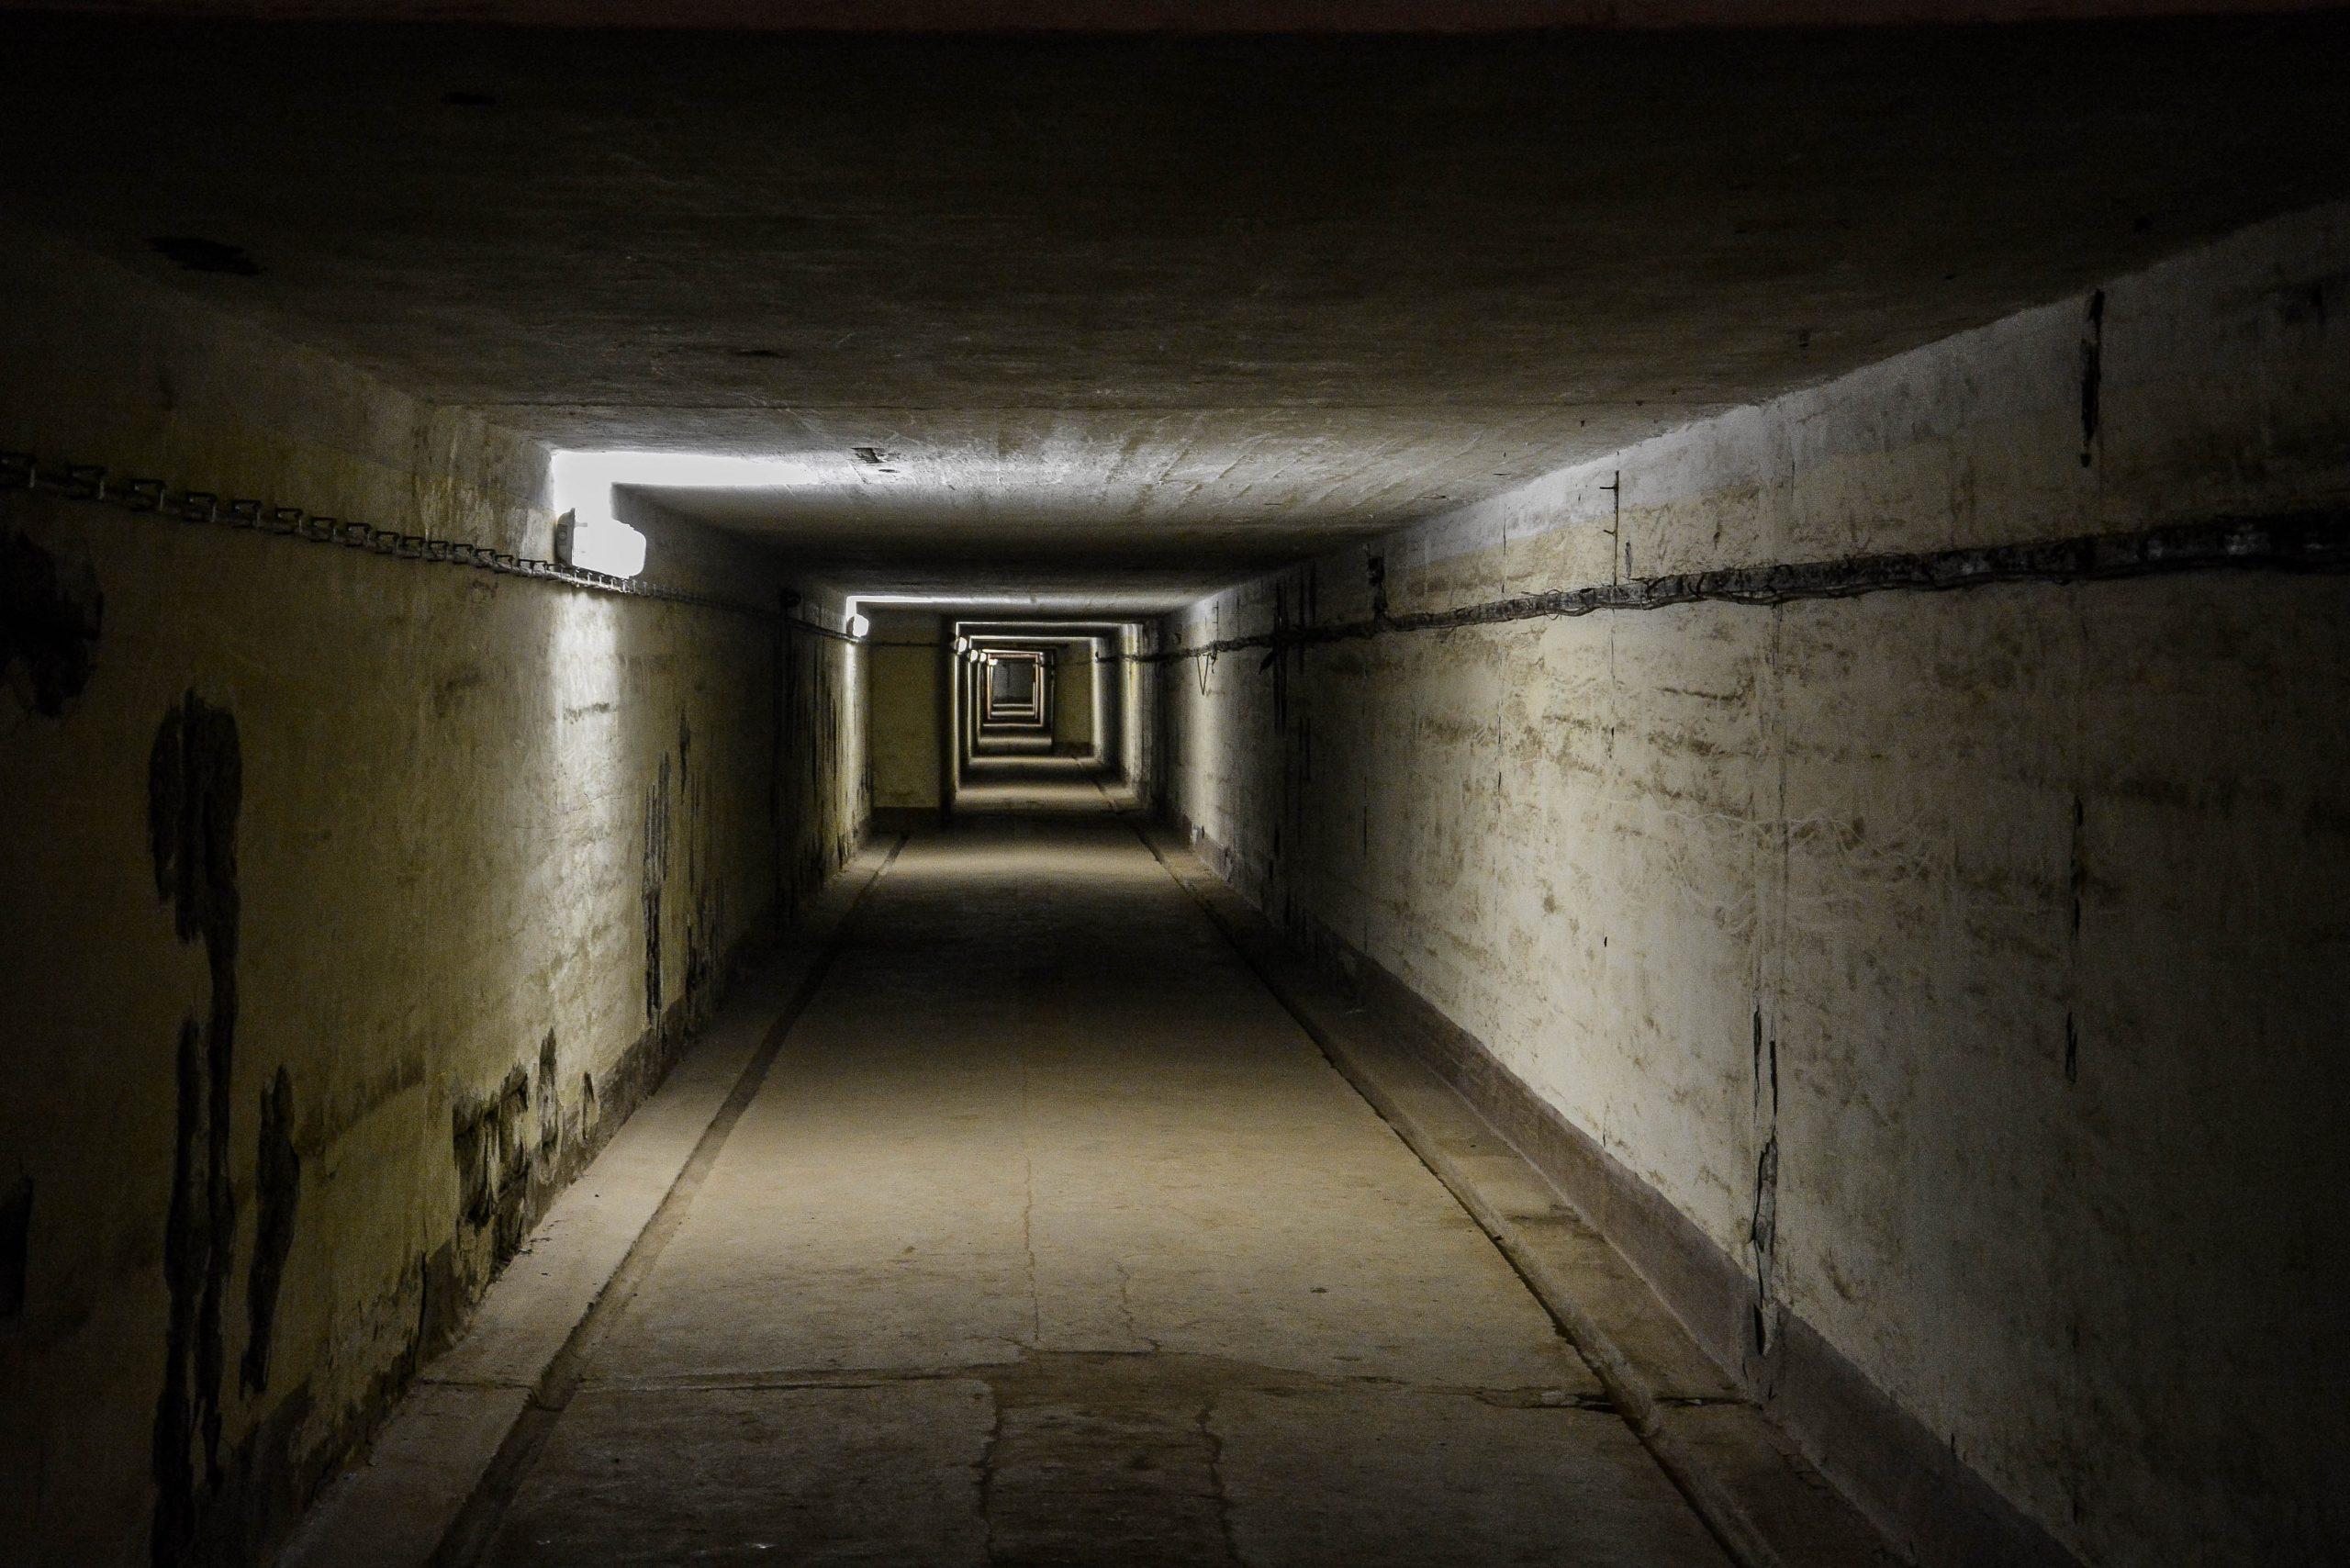 underground tunnel bunker bunker zeppelin amt 500 maybach bunker ranet wehrmacht sowjet soviet military zossen brandenburg germany lost palces urbex abandoned